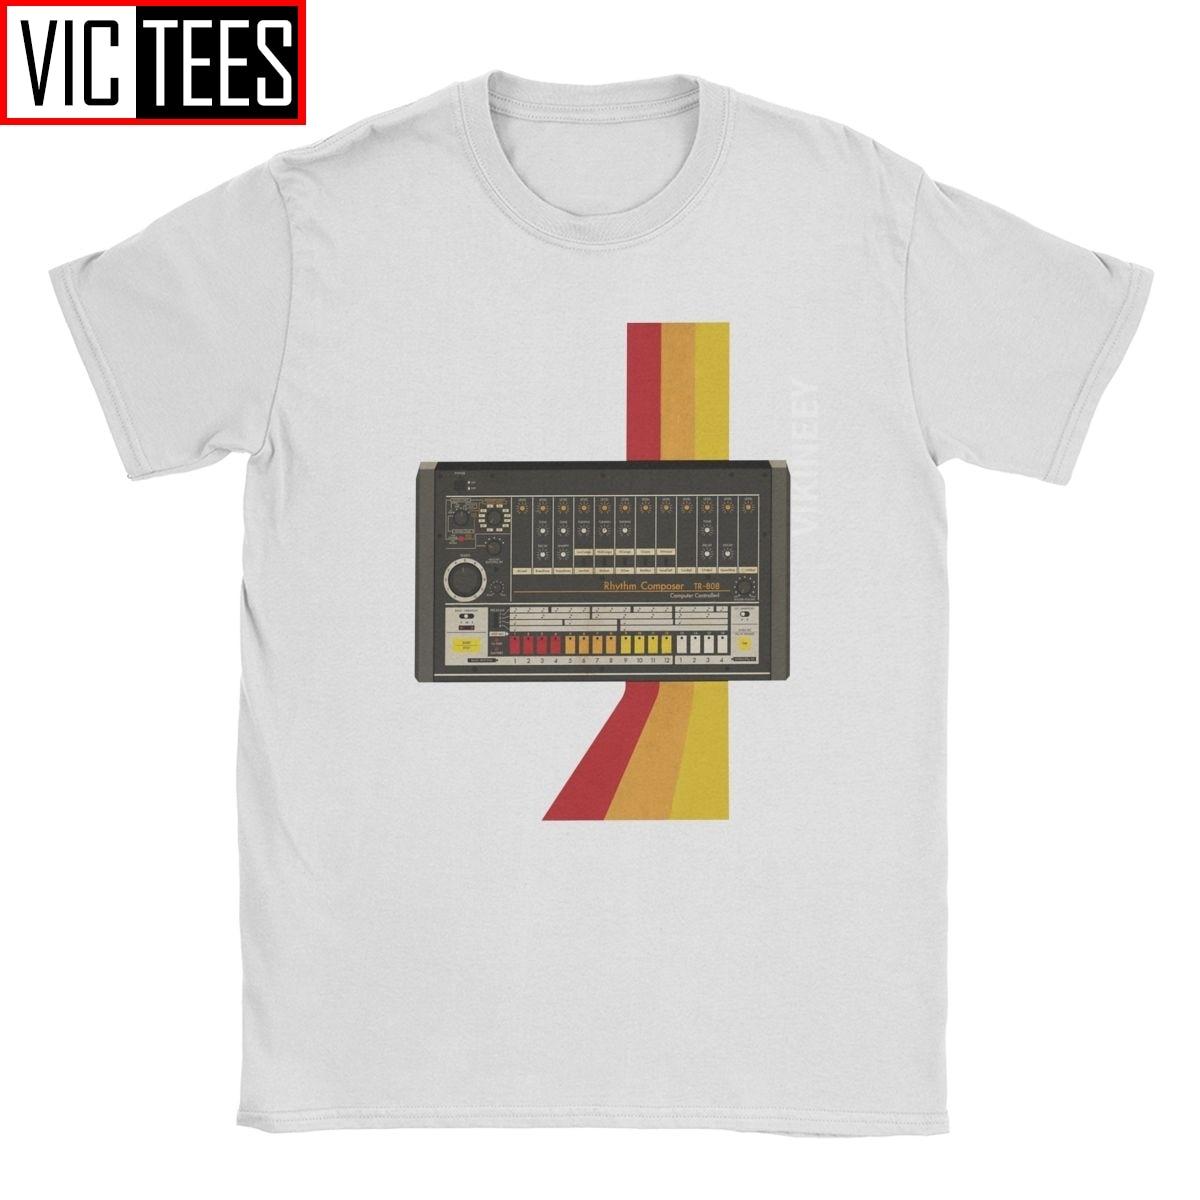 Analog Synthesizer Shirt Instrument Music T Shirts Mens Retro Design Tops Tees